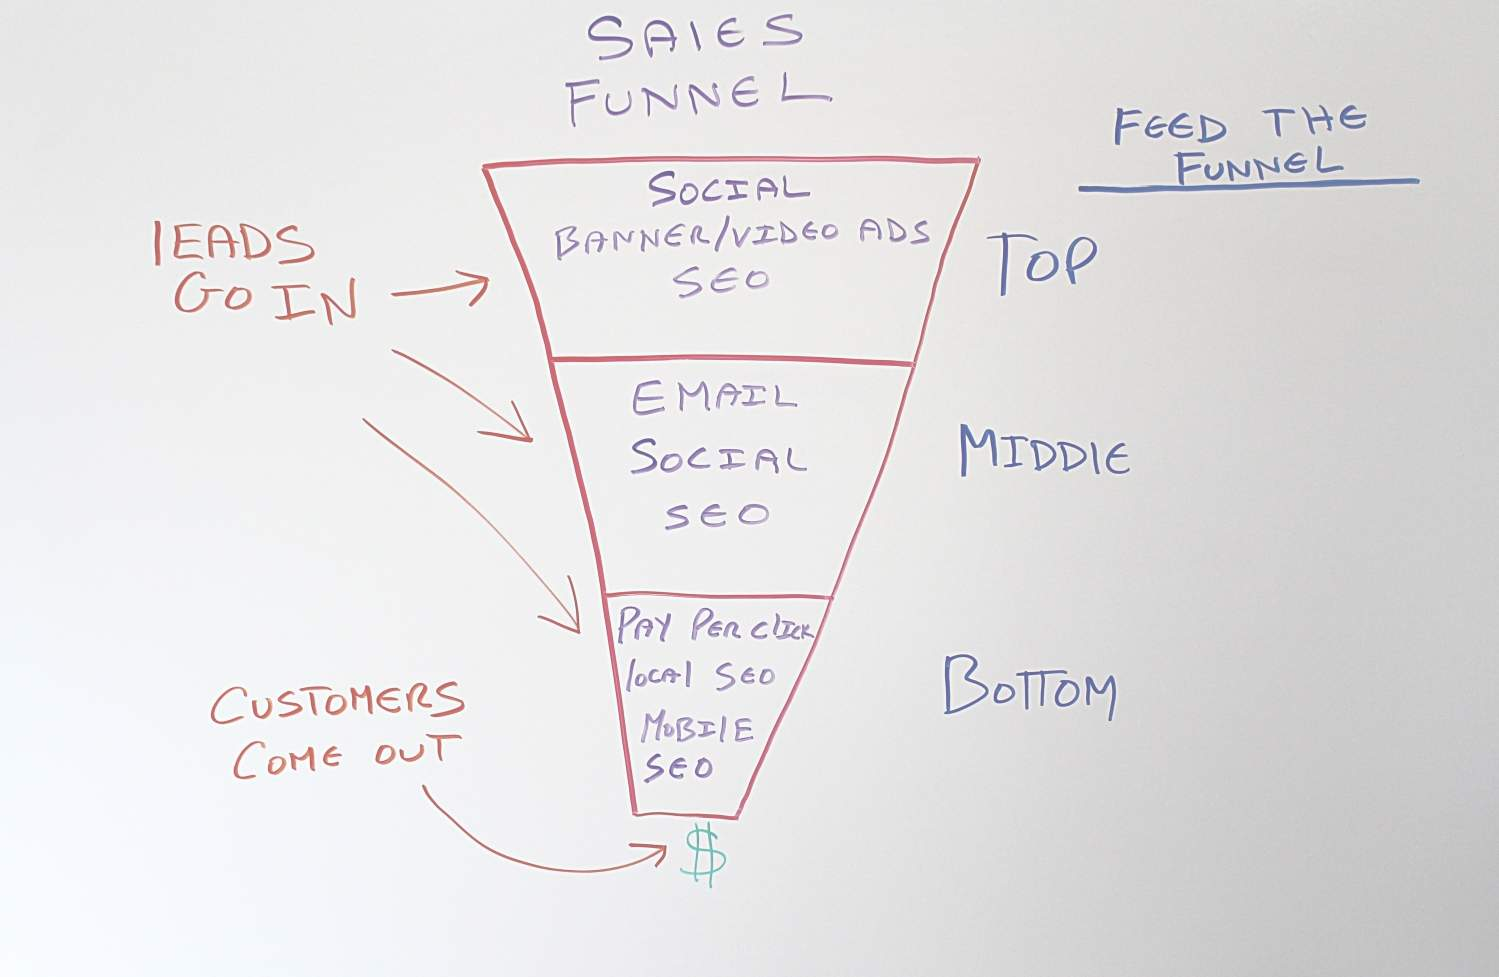 Digital Marketing Strategy Sales Funnel